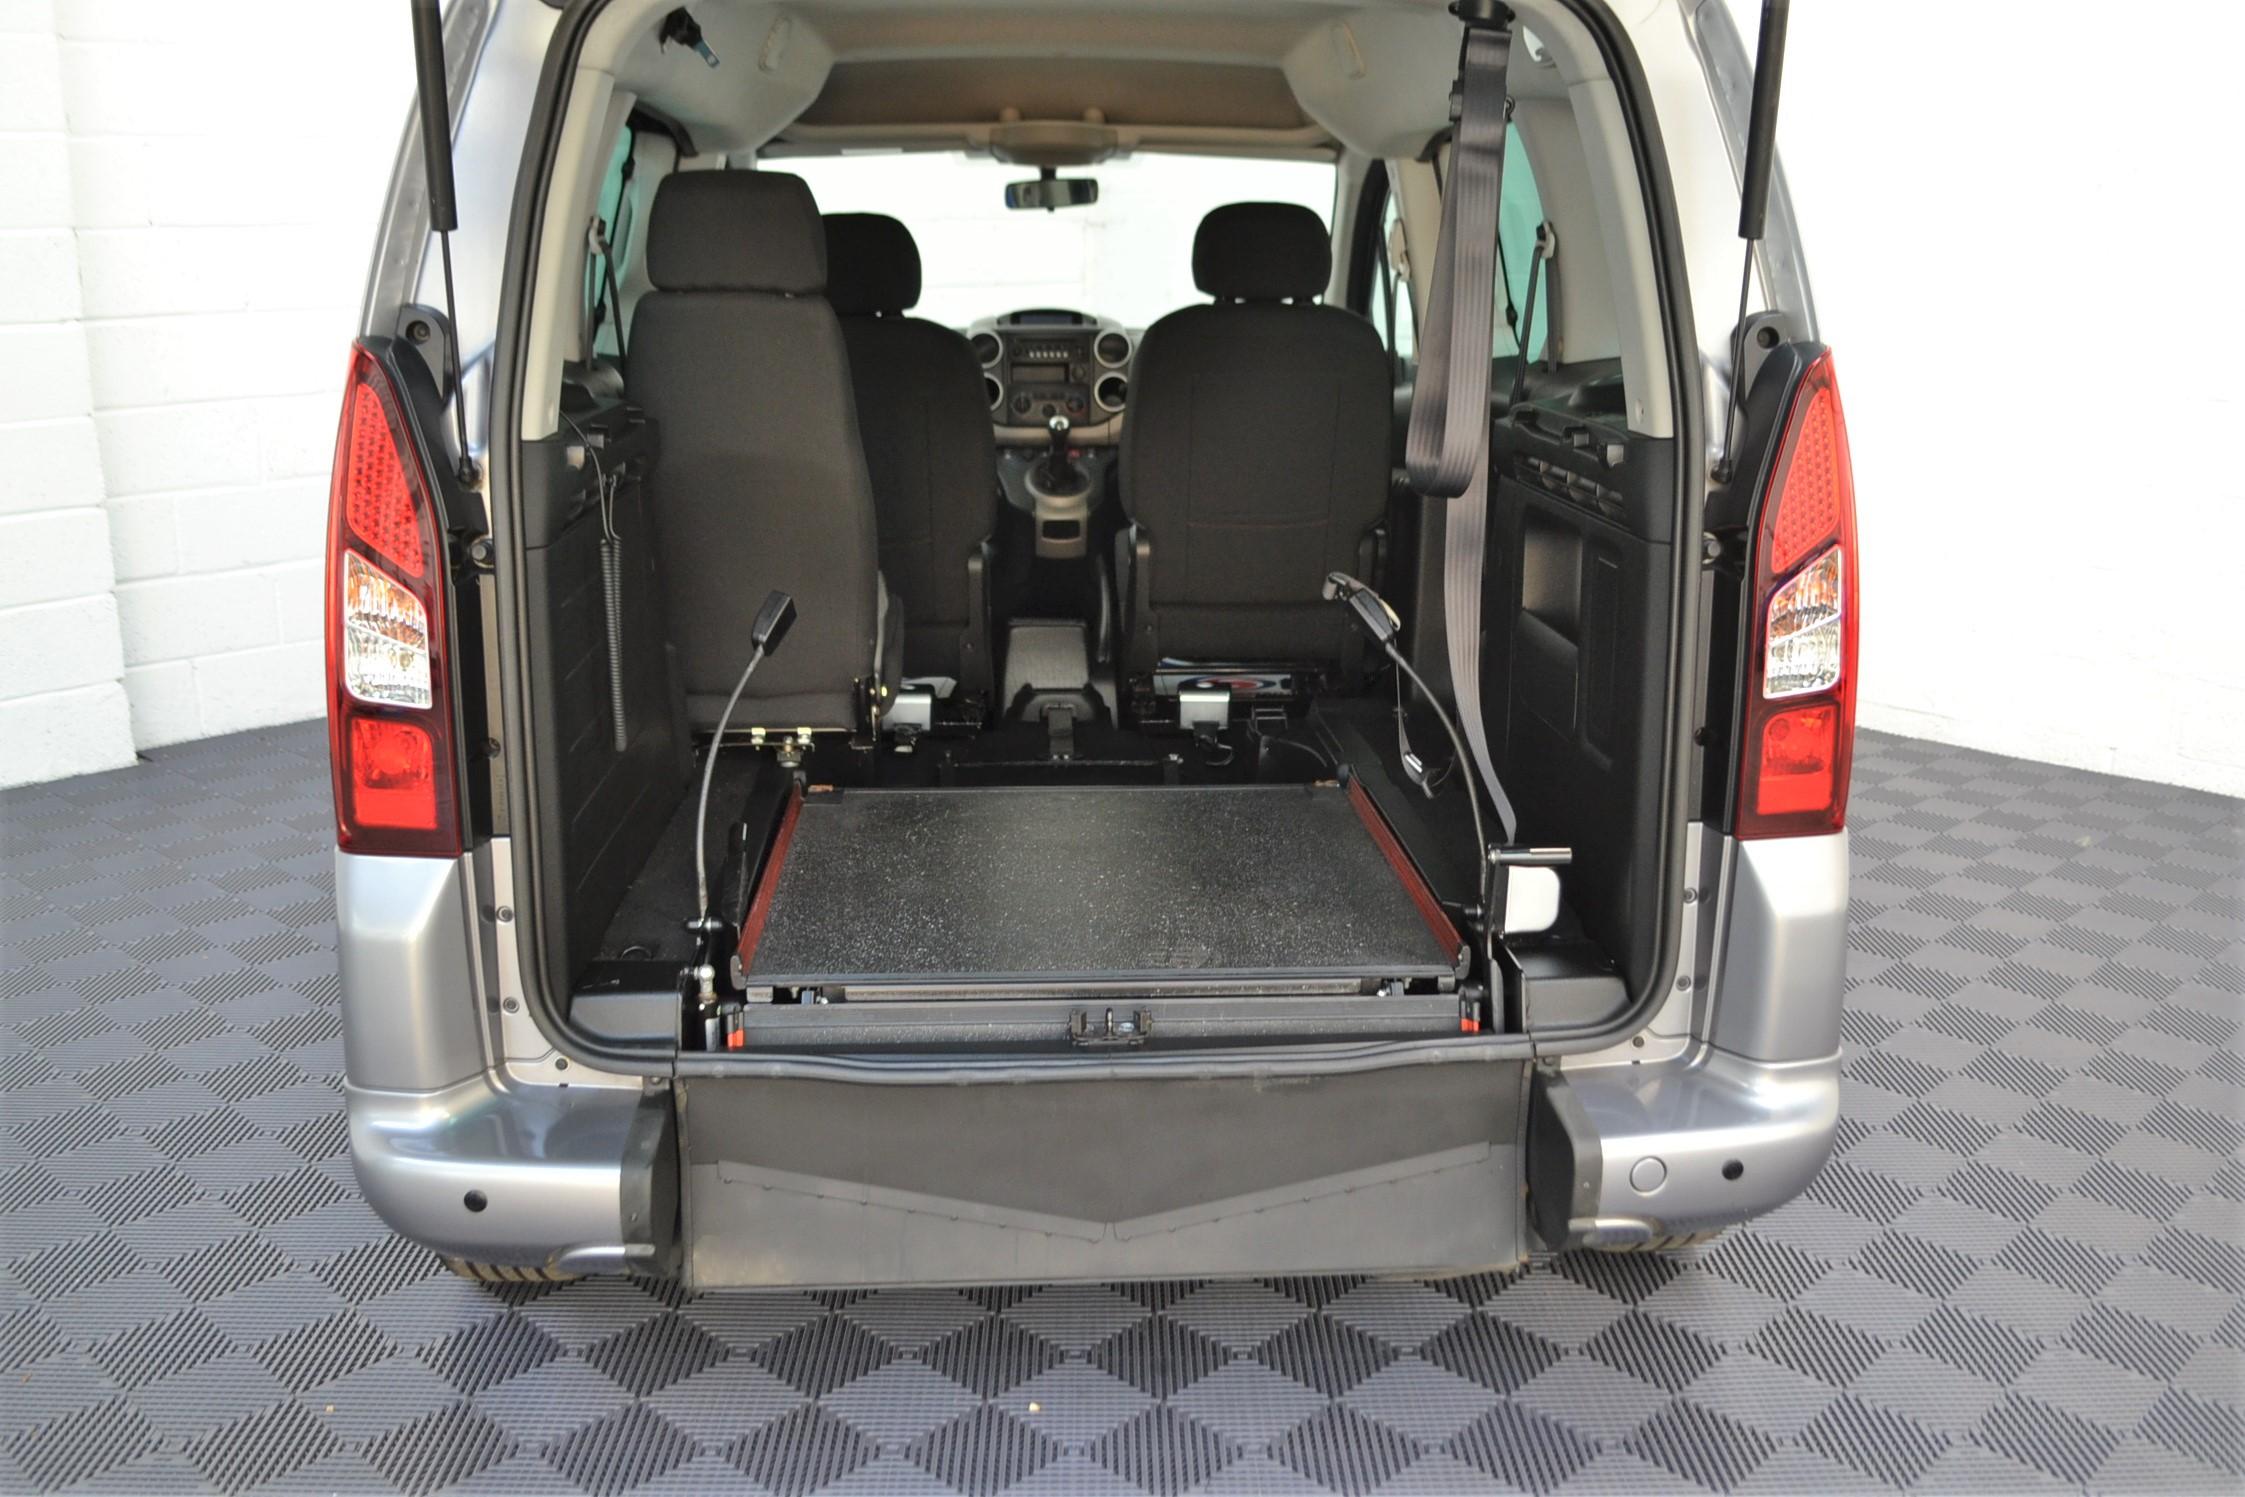 WAV Cars For Sale Bristol Wheelchair Accessible Vehicles Used For Sale Somerset Devon Dorset Bath Peugeot Partner SD17 OZL 23